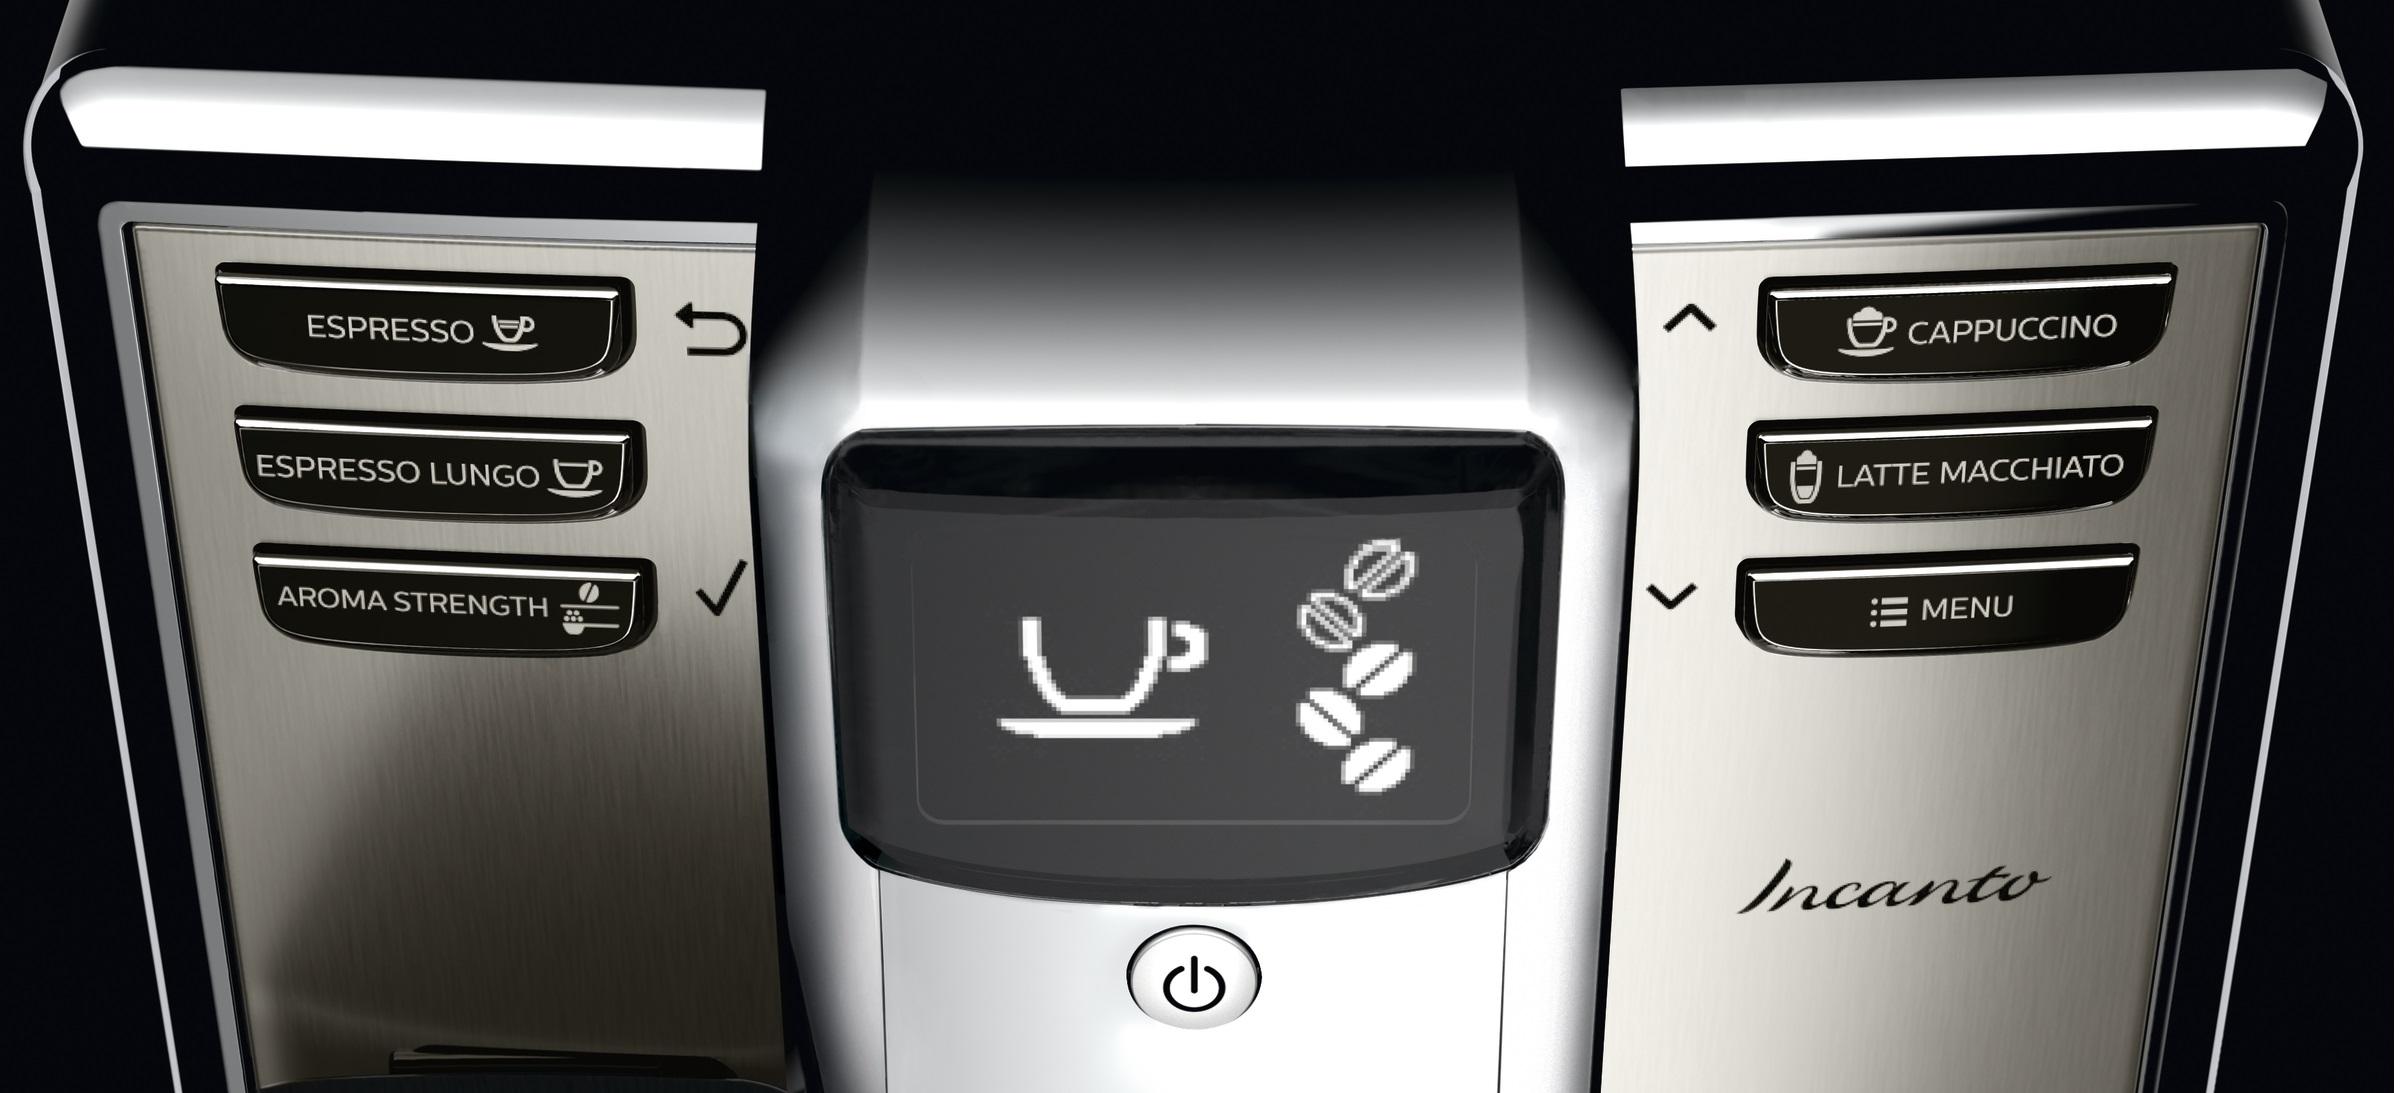 Philips espressomachine Incanto scherm